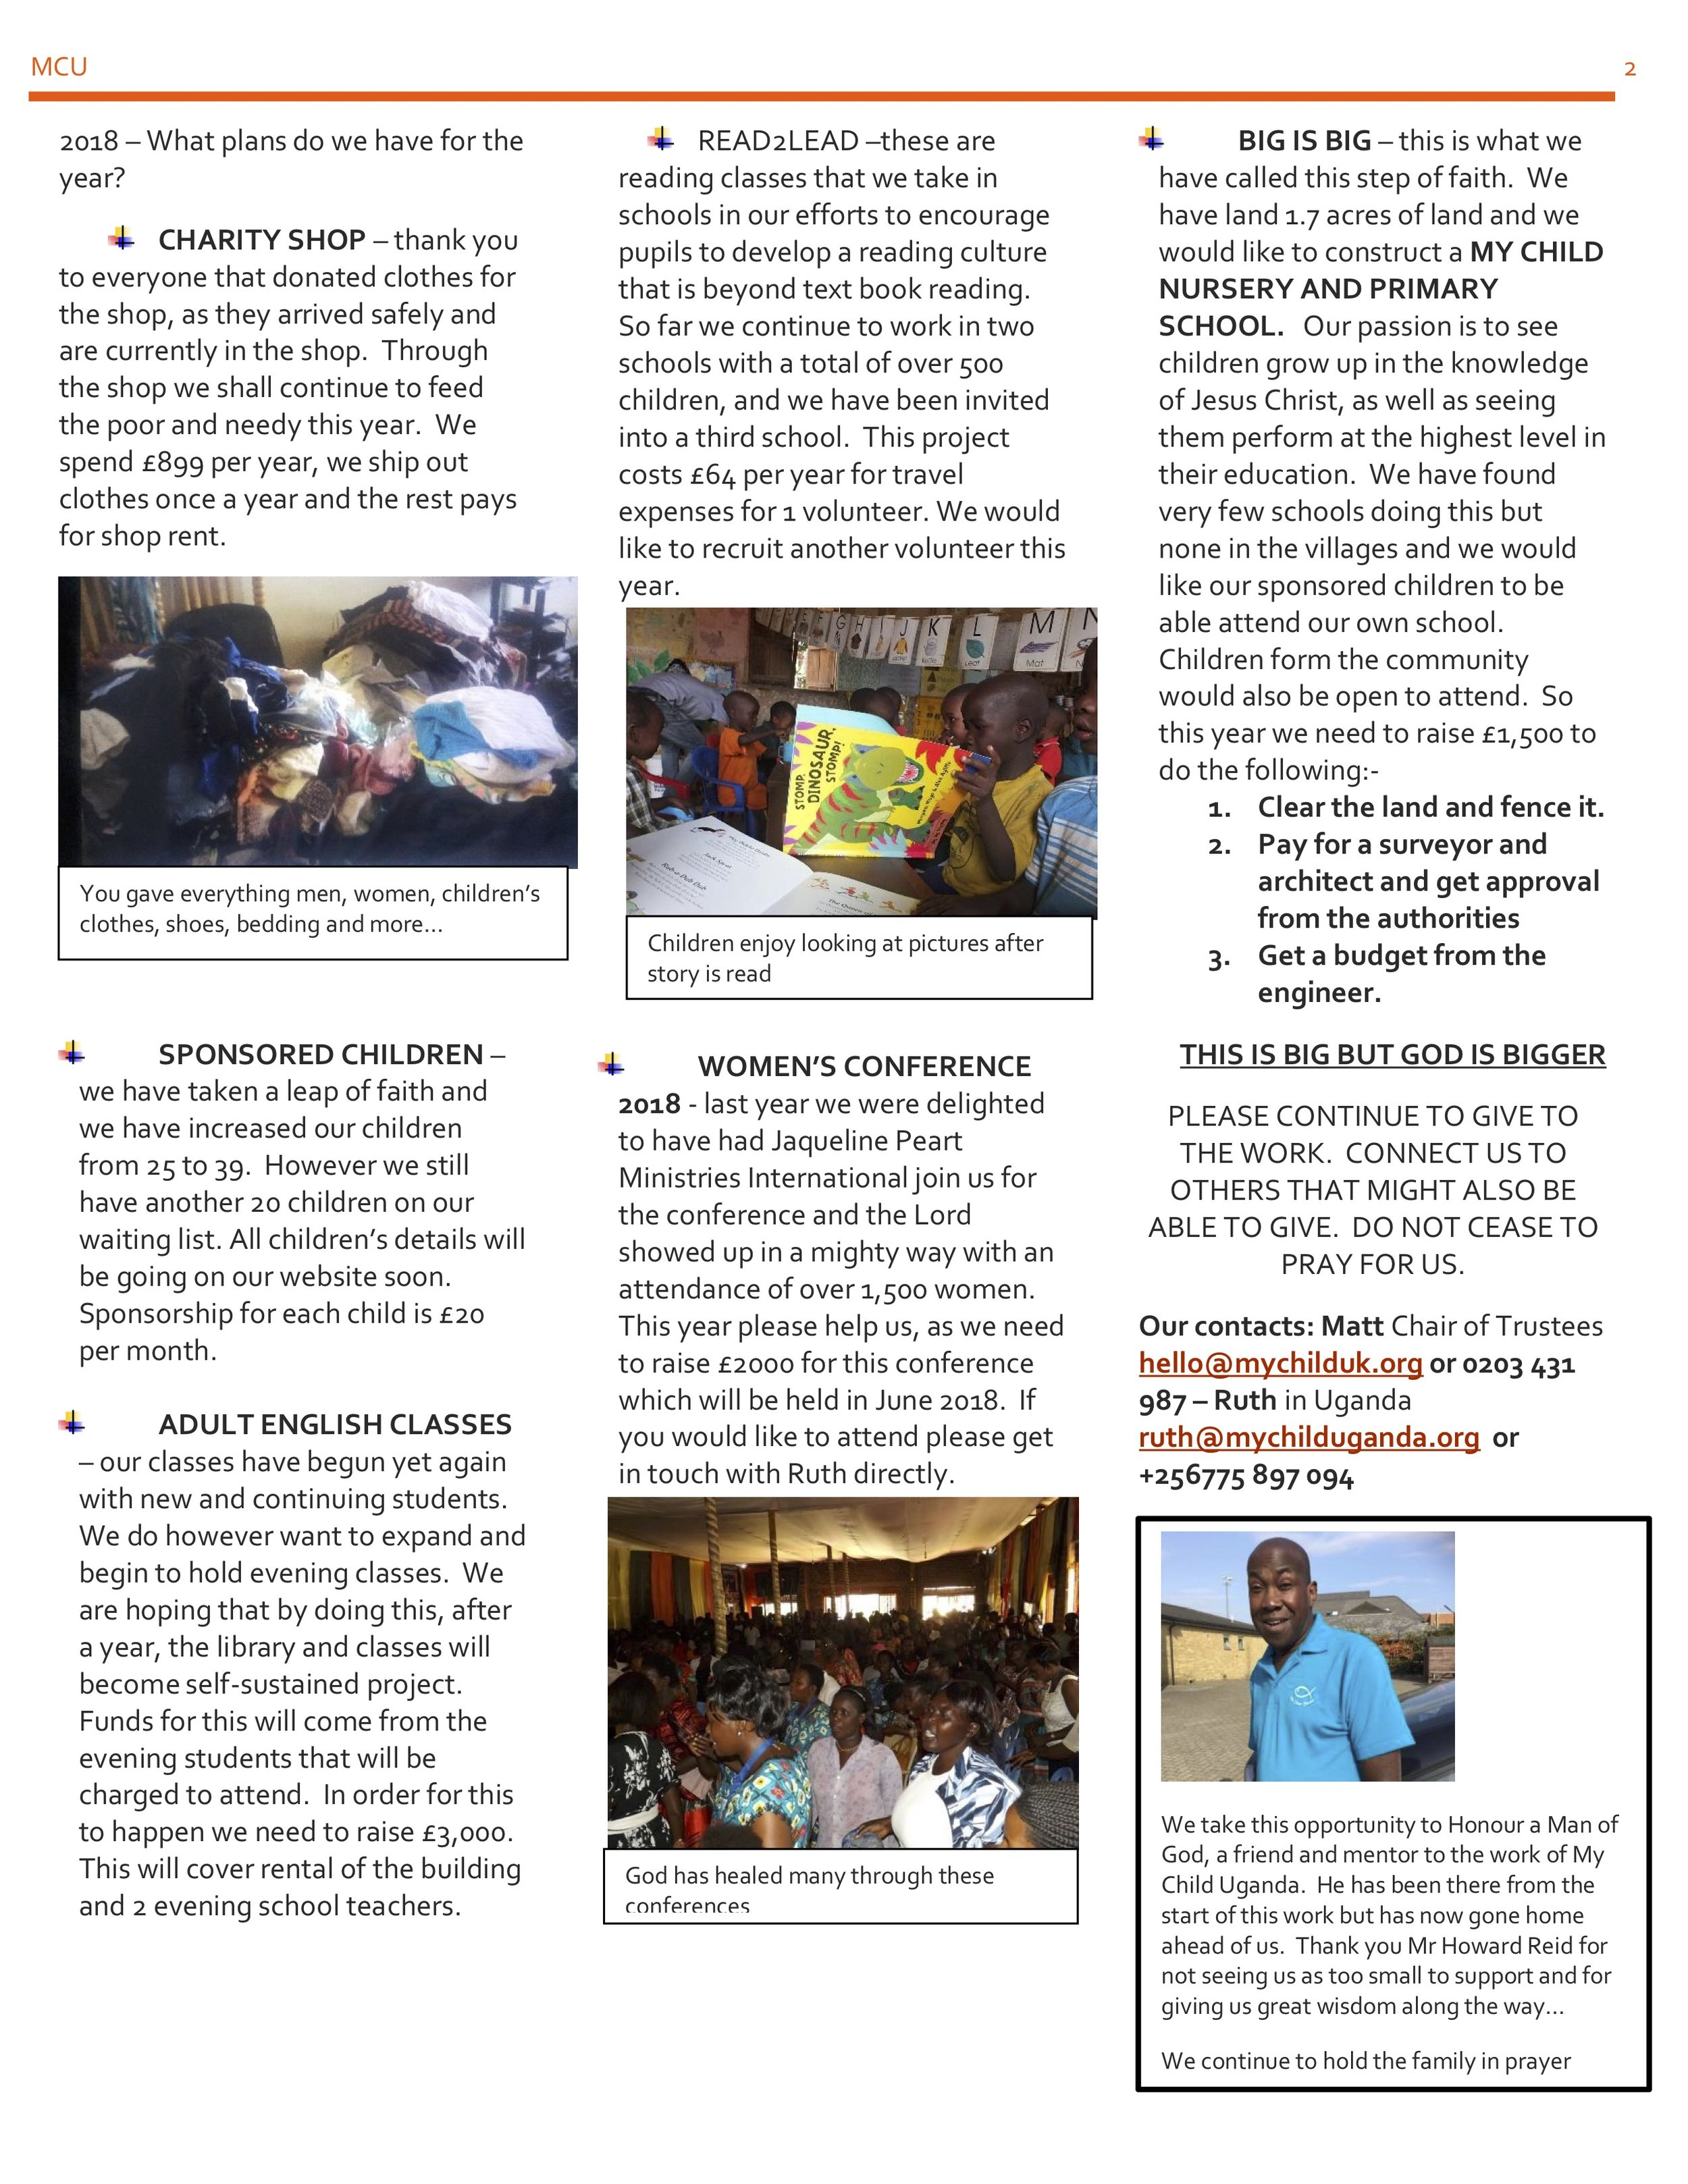 MCU Newsletter March 2018 Pt2